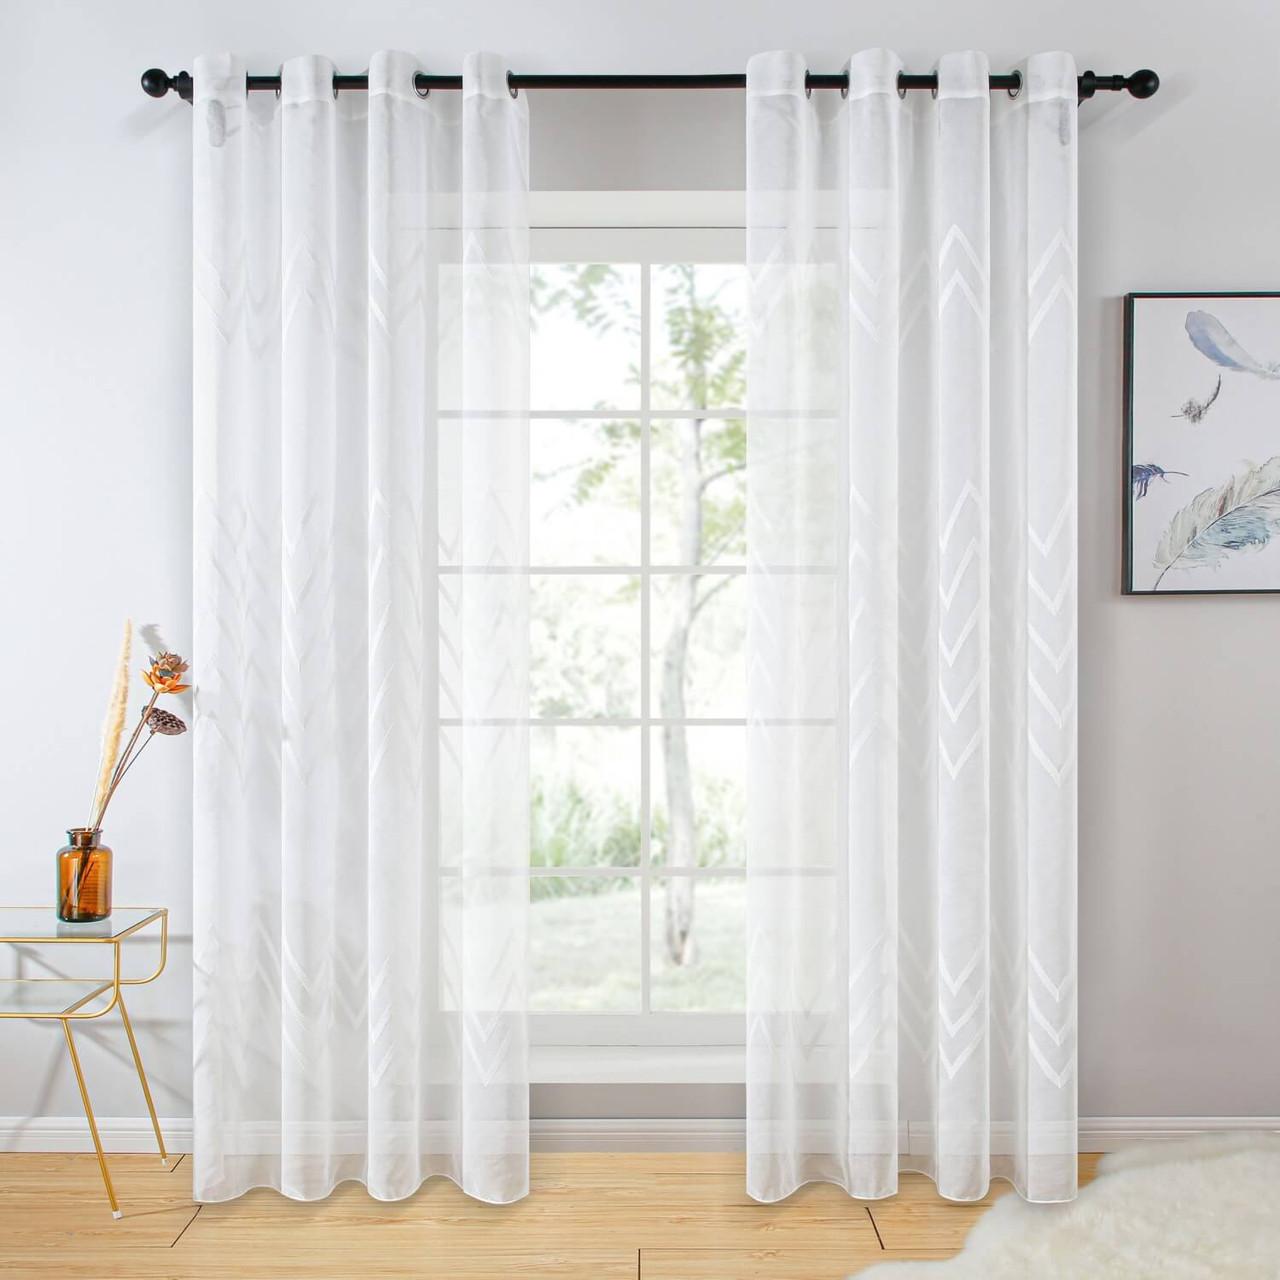 Sheer Curtain Panel Grommet-Top Window Treatments DMC727 Dolce Mela 8171460151914